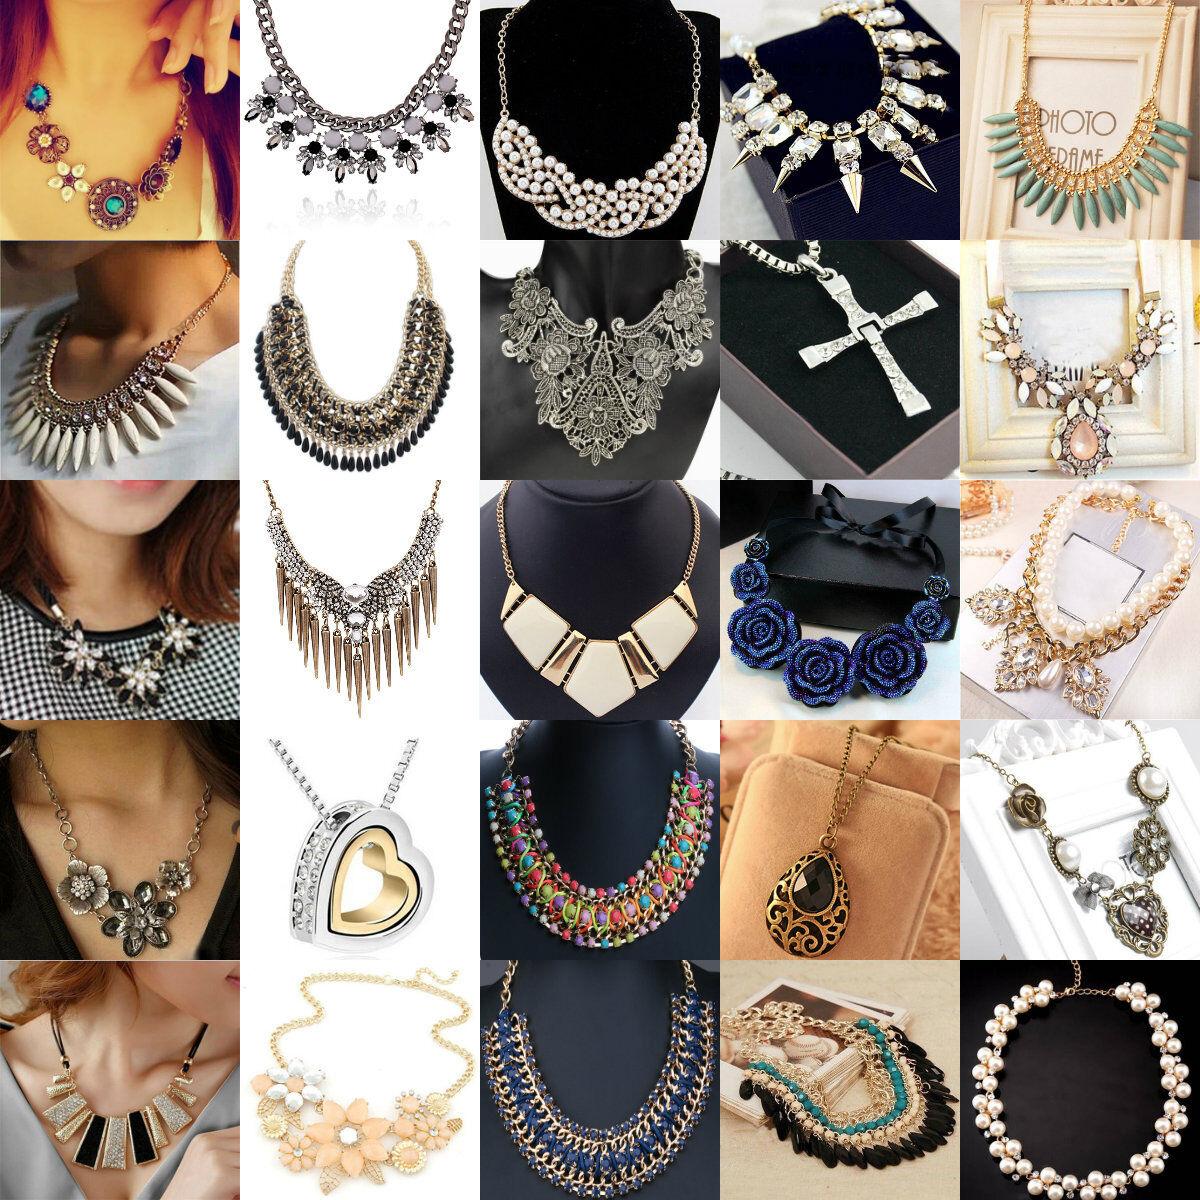 Jewellery - New Fashion Women's Crystal Chunky Collar Statement Bib Necklace NECK-03 Jewelry